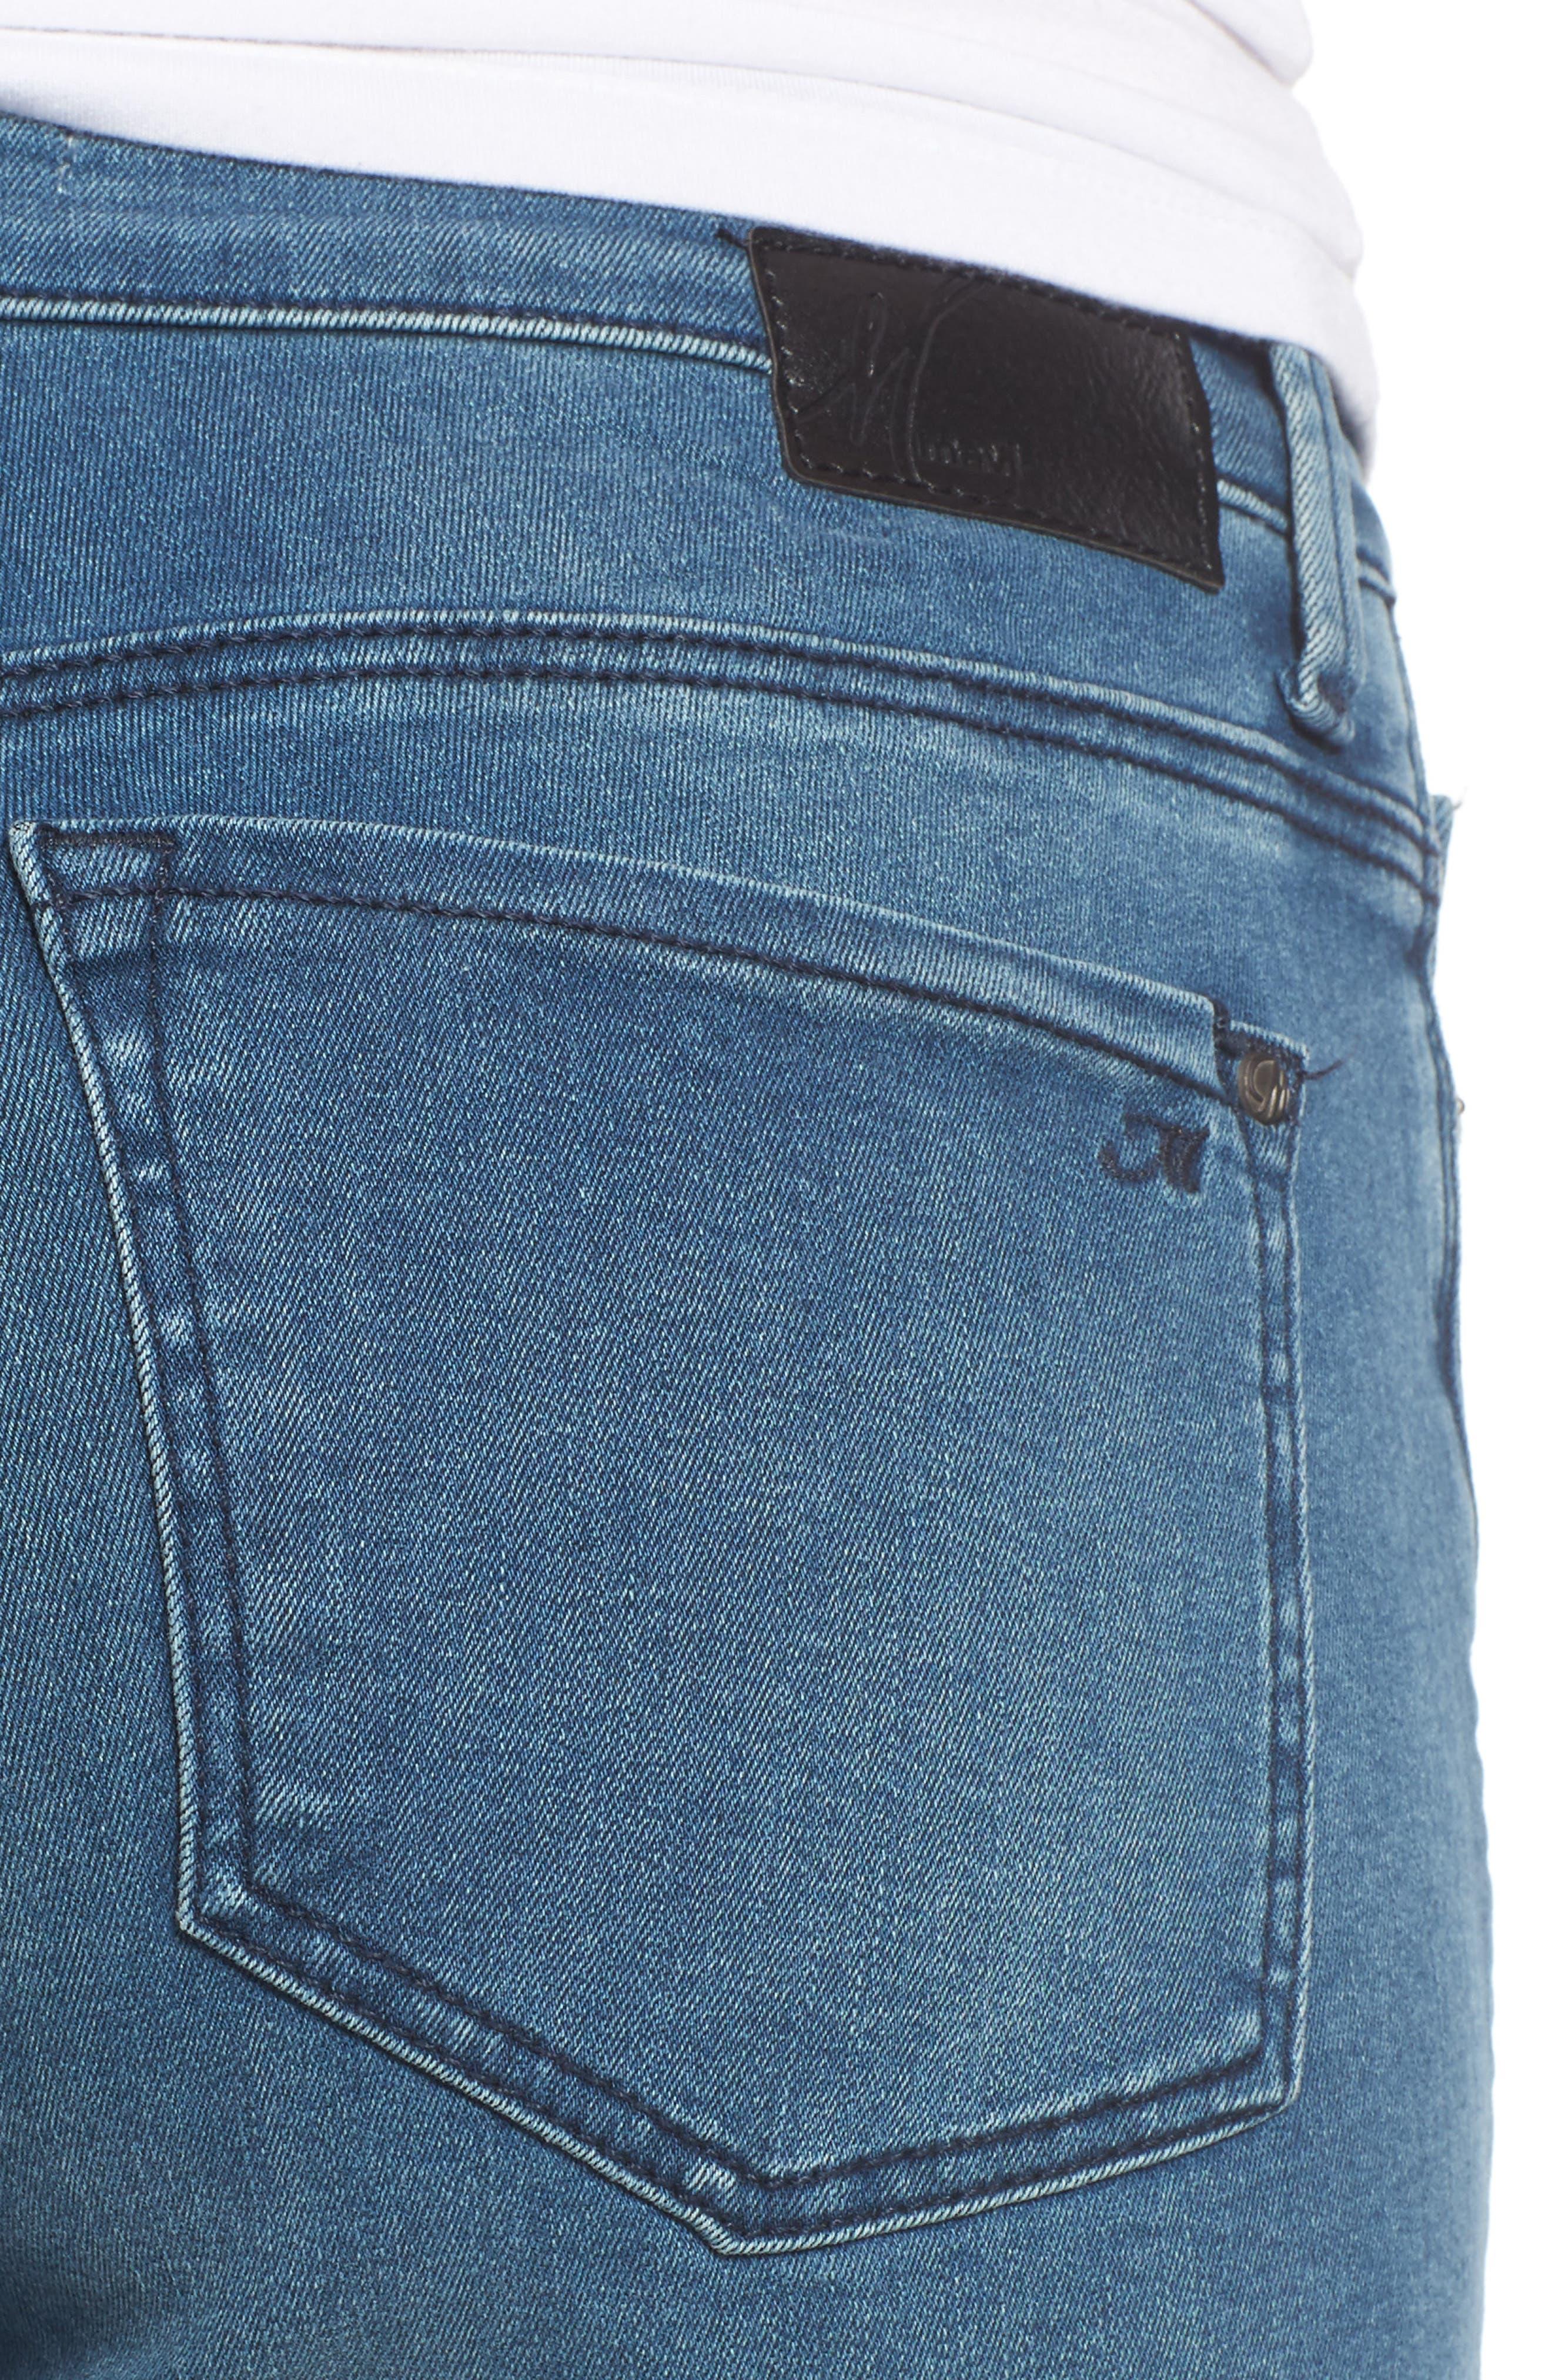 Kendra High Waist Straight Leg Jeans,                             Alternate thumbnail 4, color,                             420